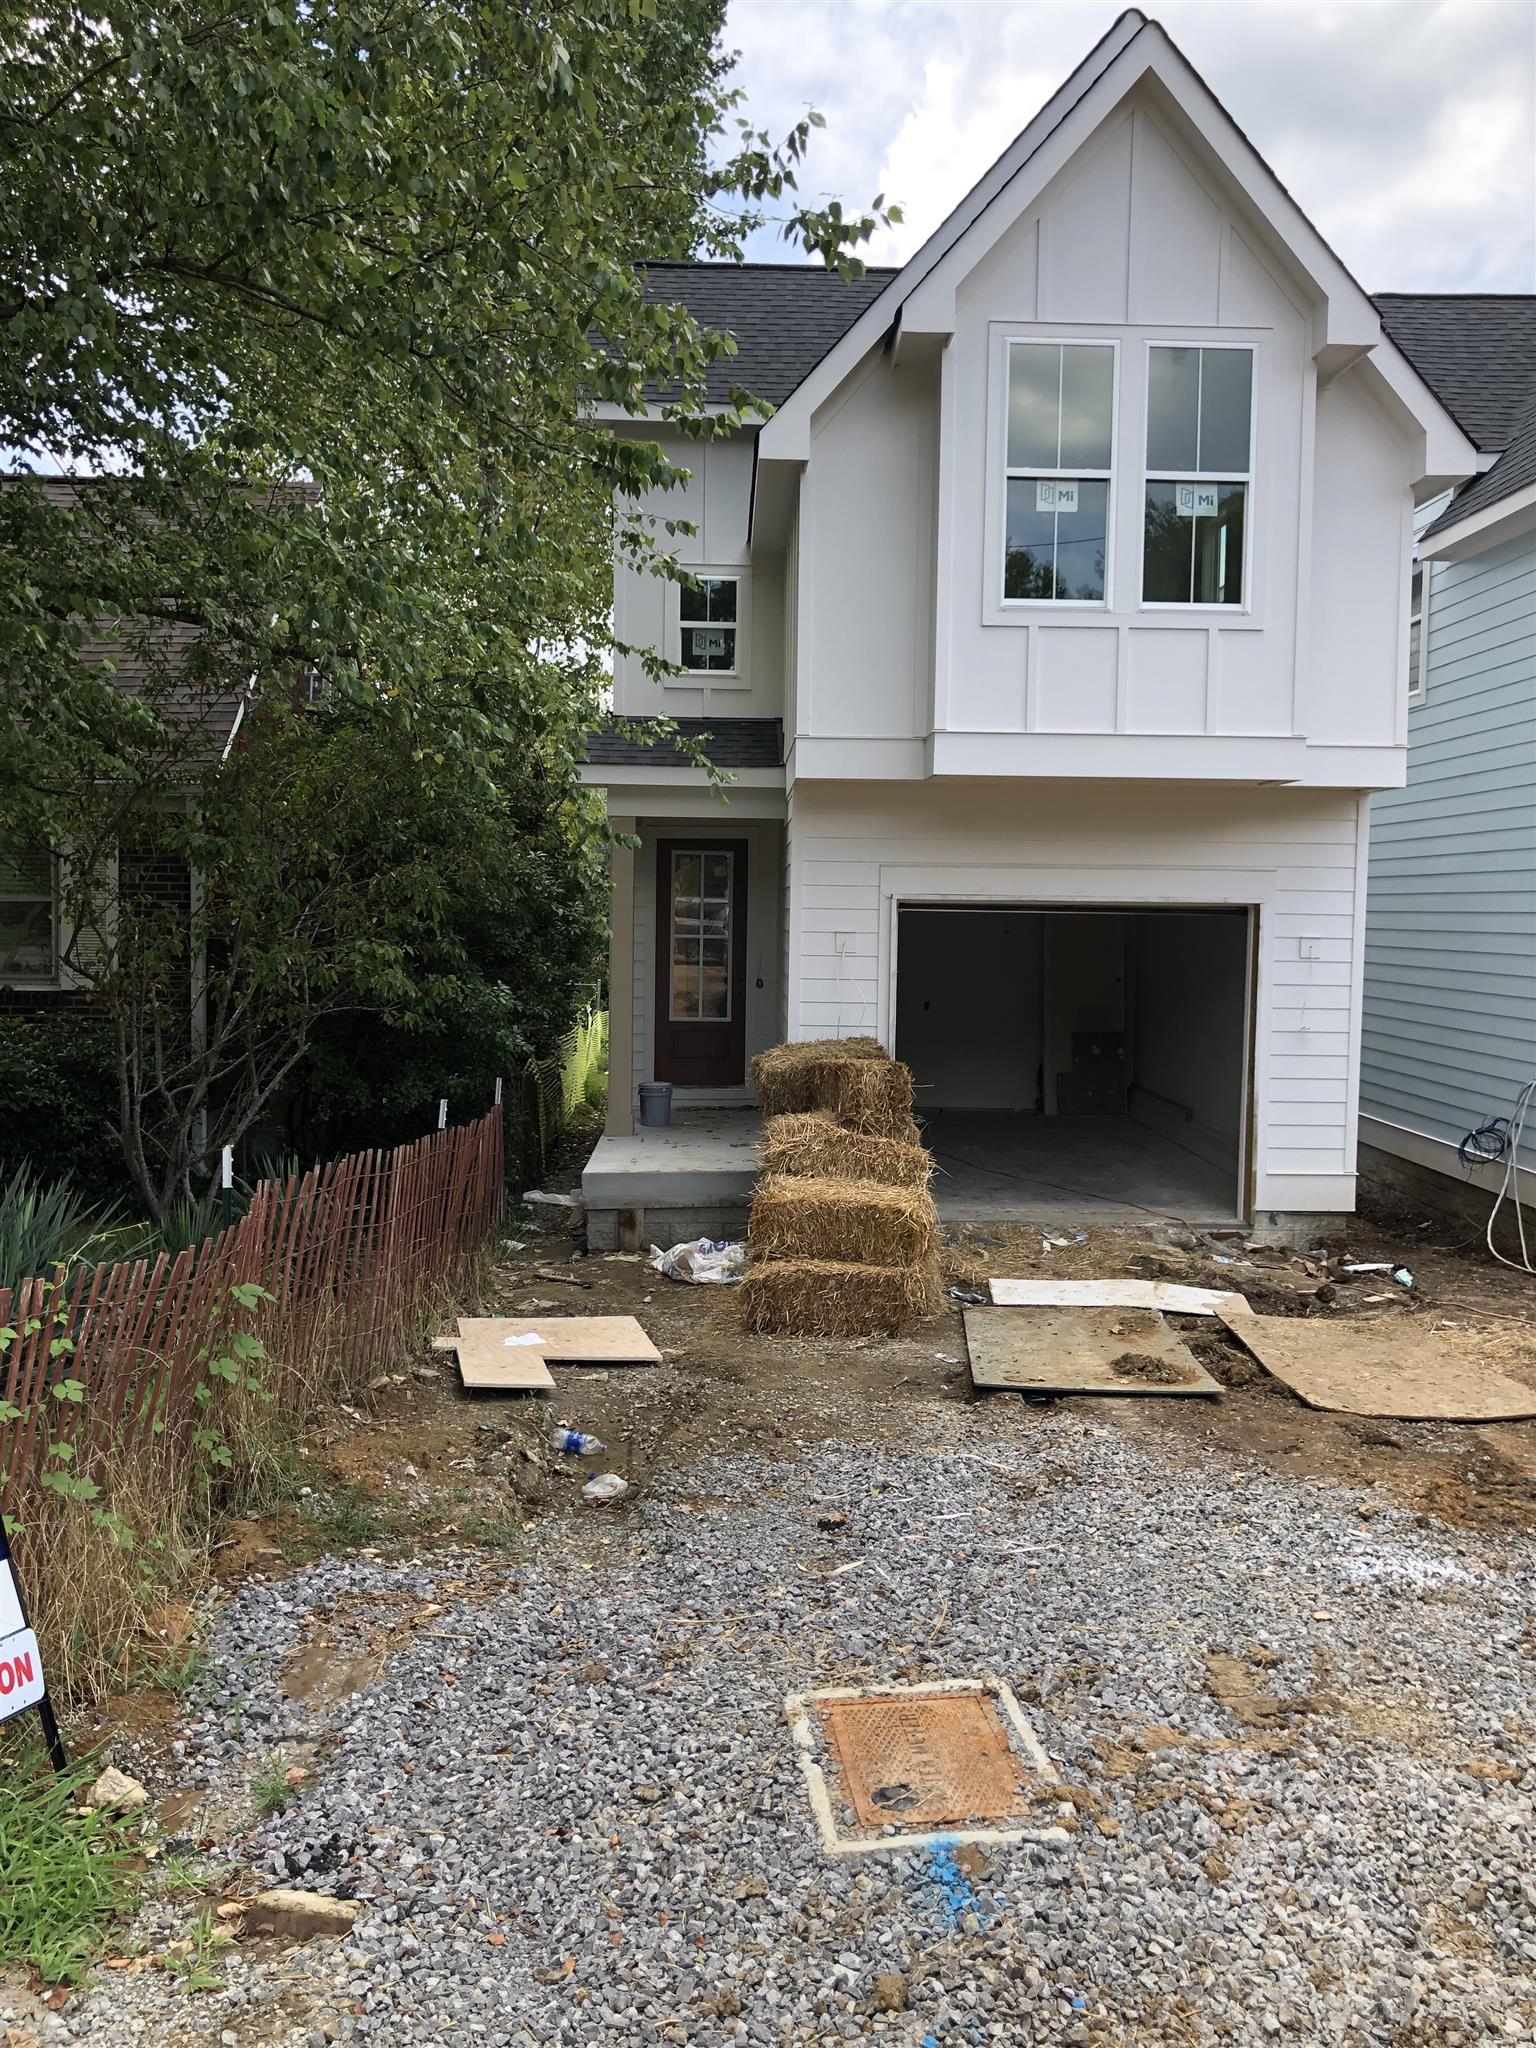 419 Saint Francis Ave, Nashville, TN 37205 - Nashville, TN real estate listing